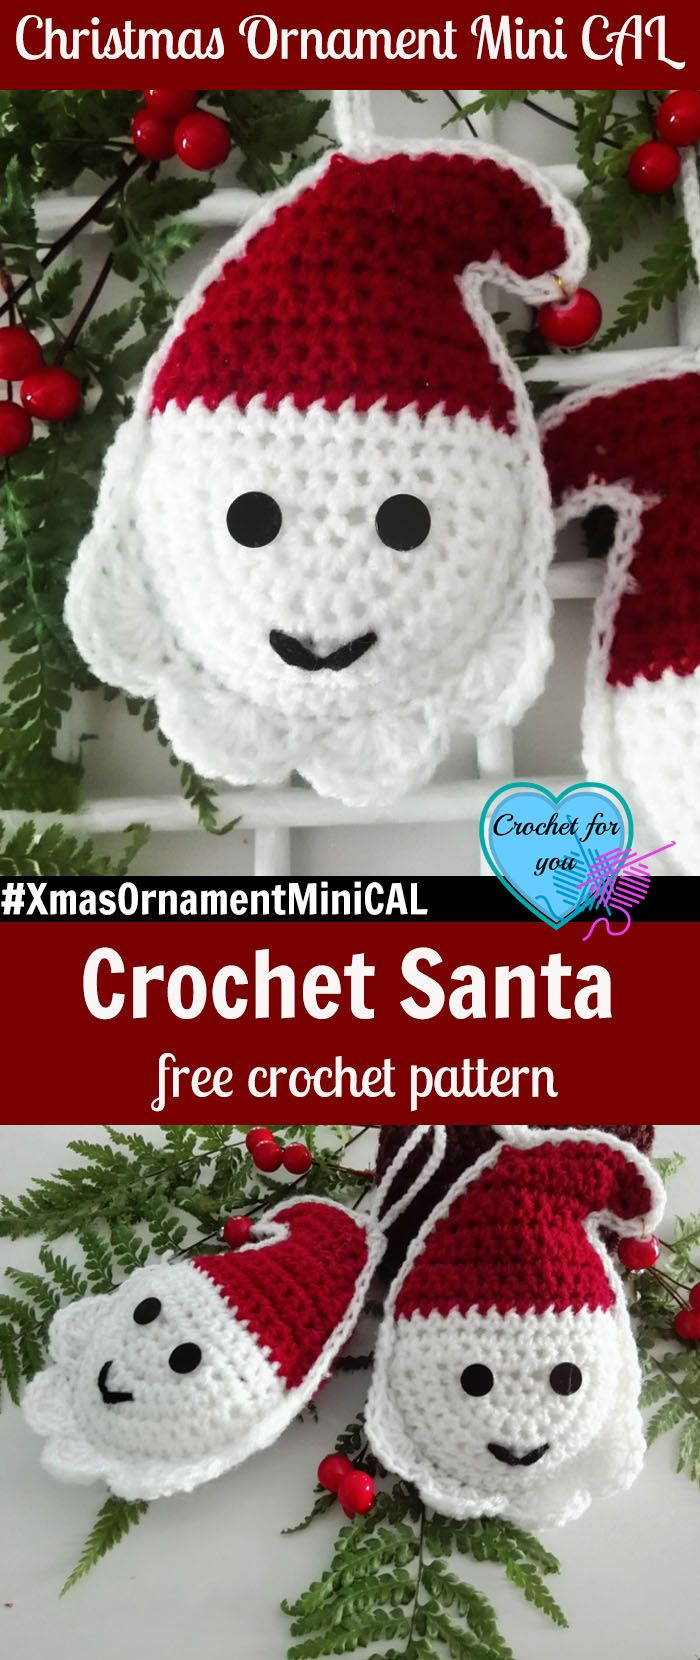 Christmas Ornament Mini CAL - Crochet Santa. #XmasOrnamentMiniCAL